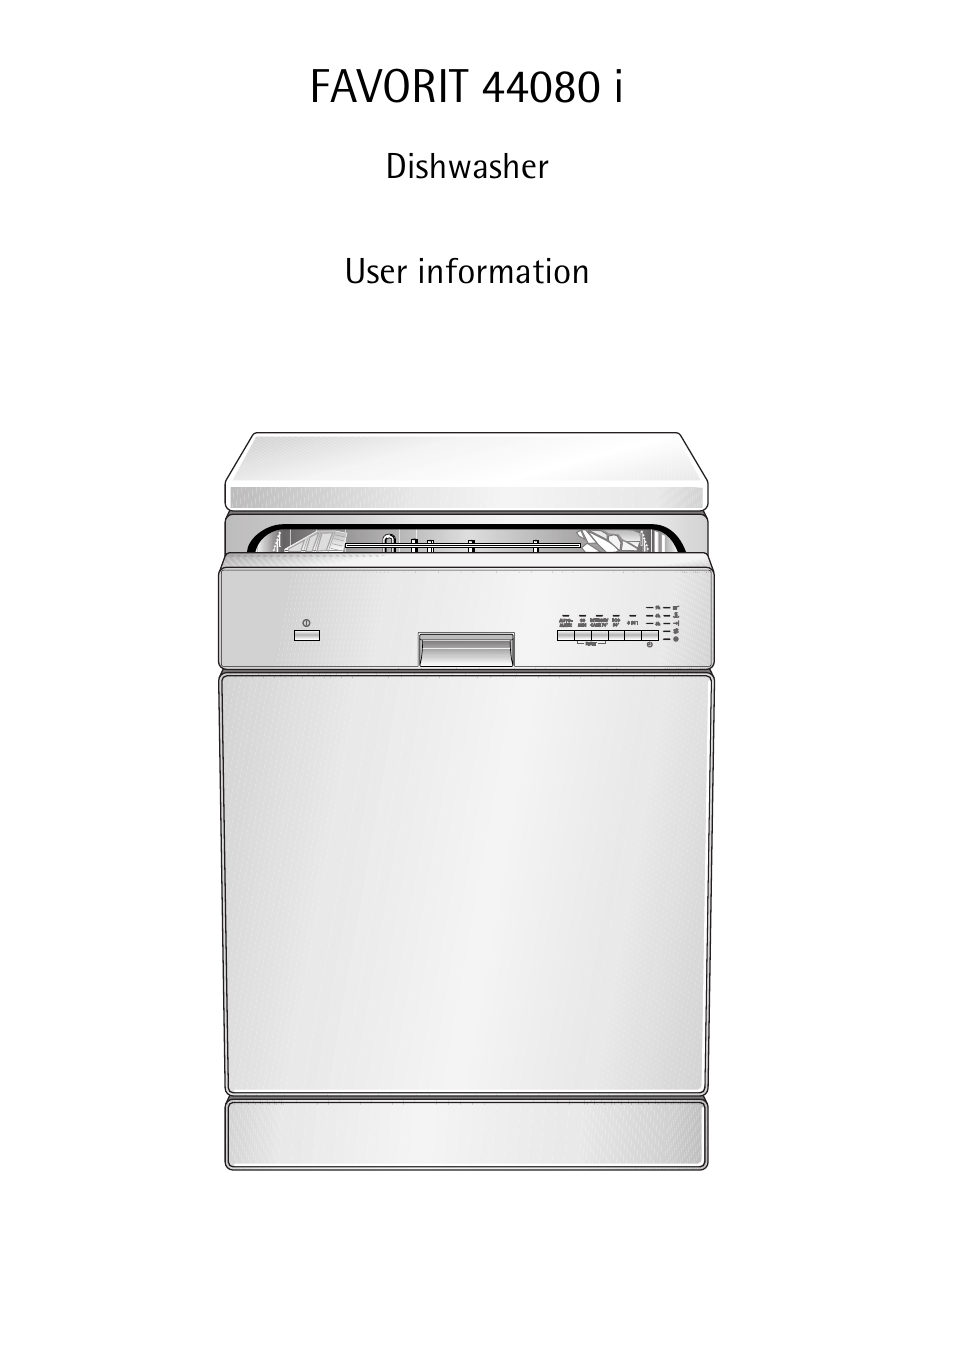 aeg favorit 44080 i user manual 48 pages rh manualsdir com aeg electrolux favorit sensorlogic dishwasher user manual Electrolux Dishwasher Lights Flashing